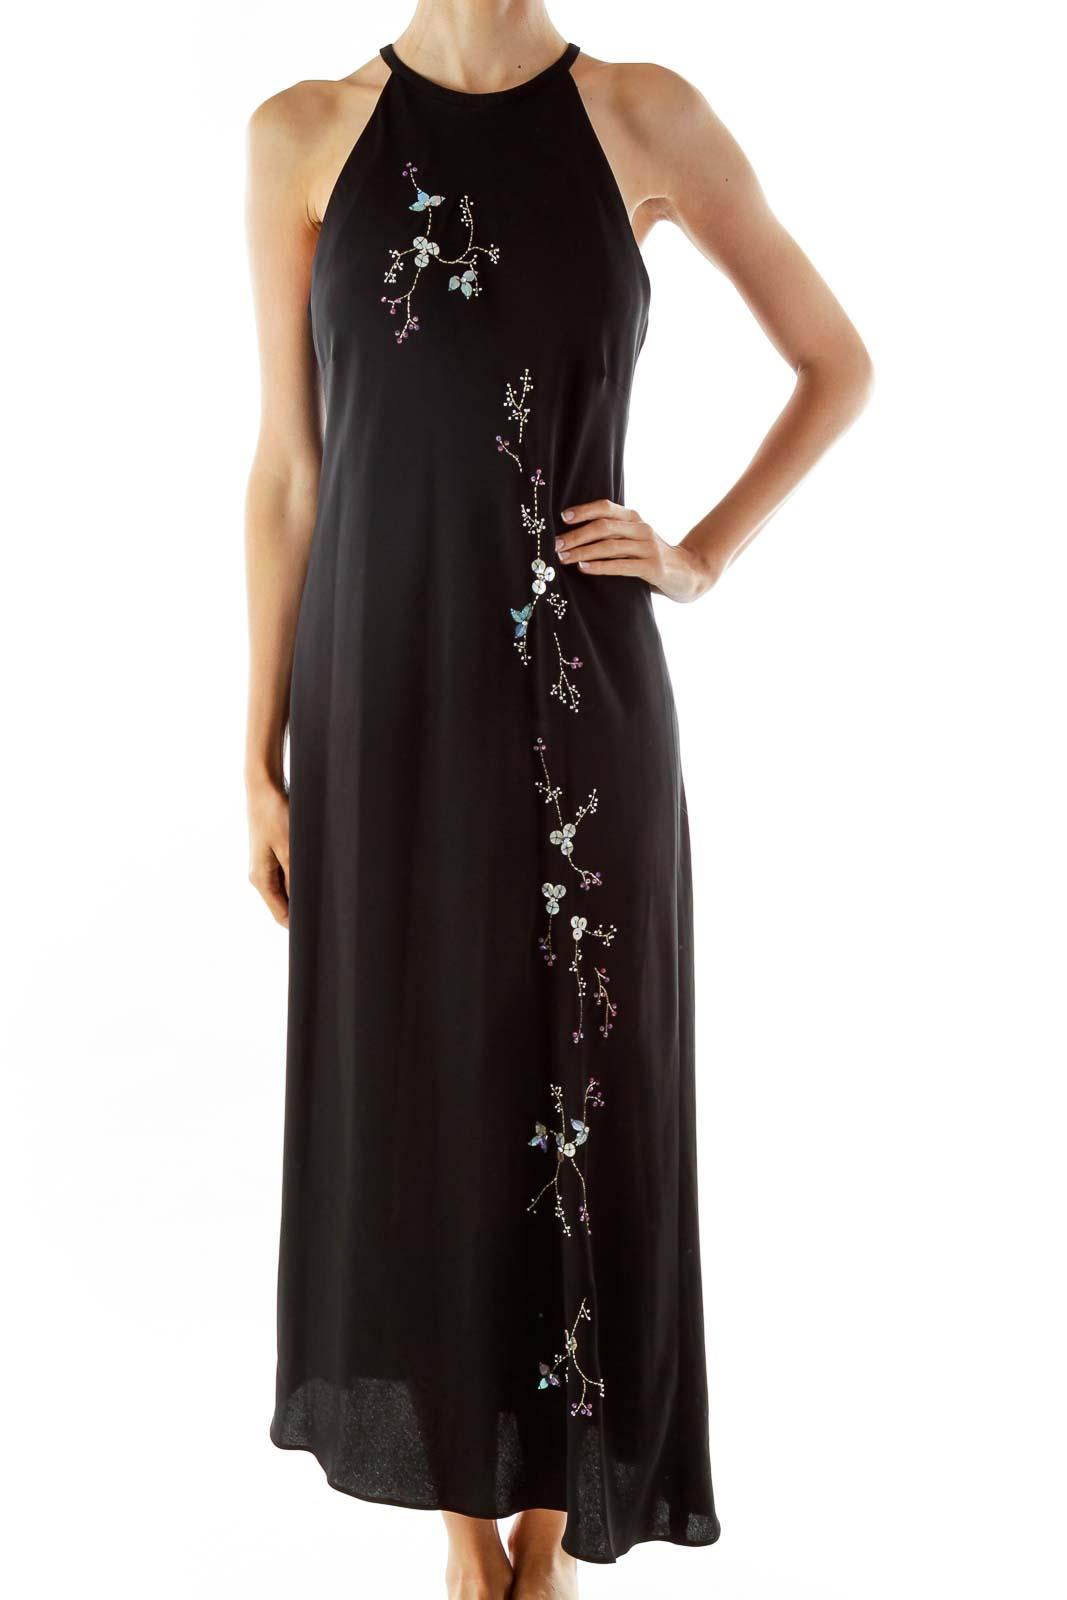 Black Embroidered Slip Evening Dress Front